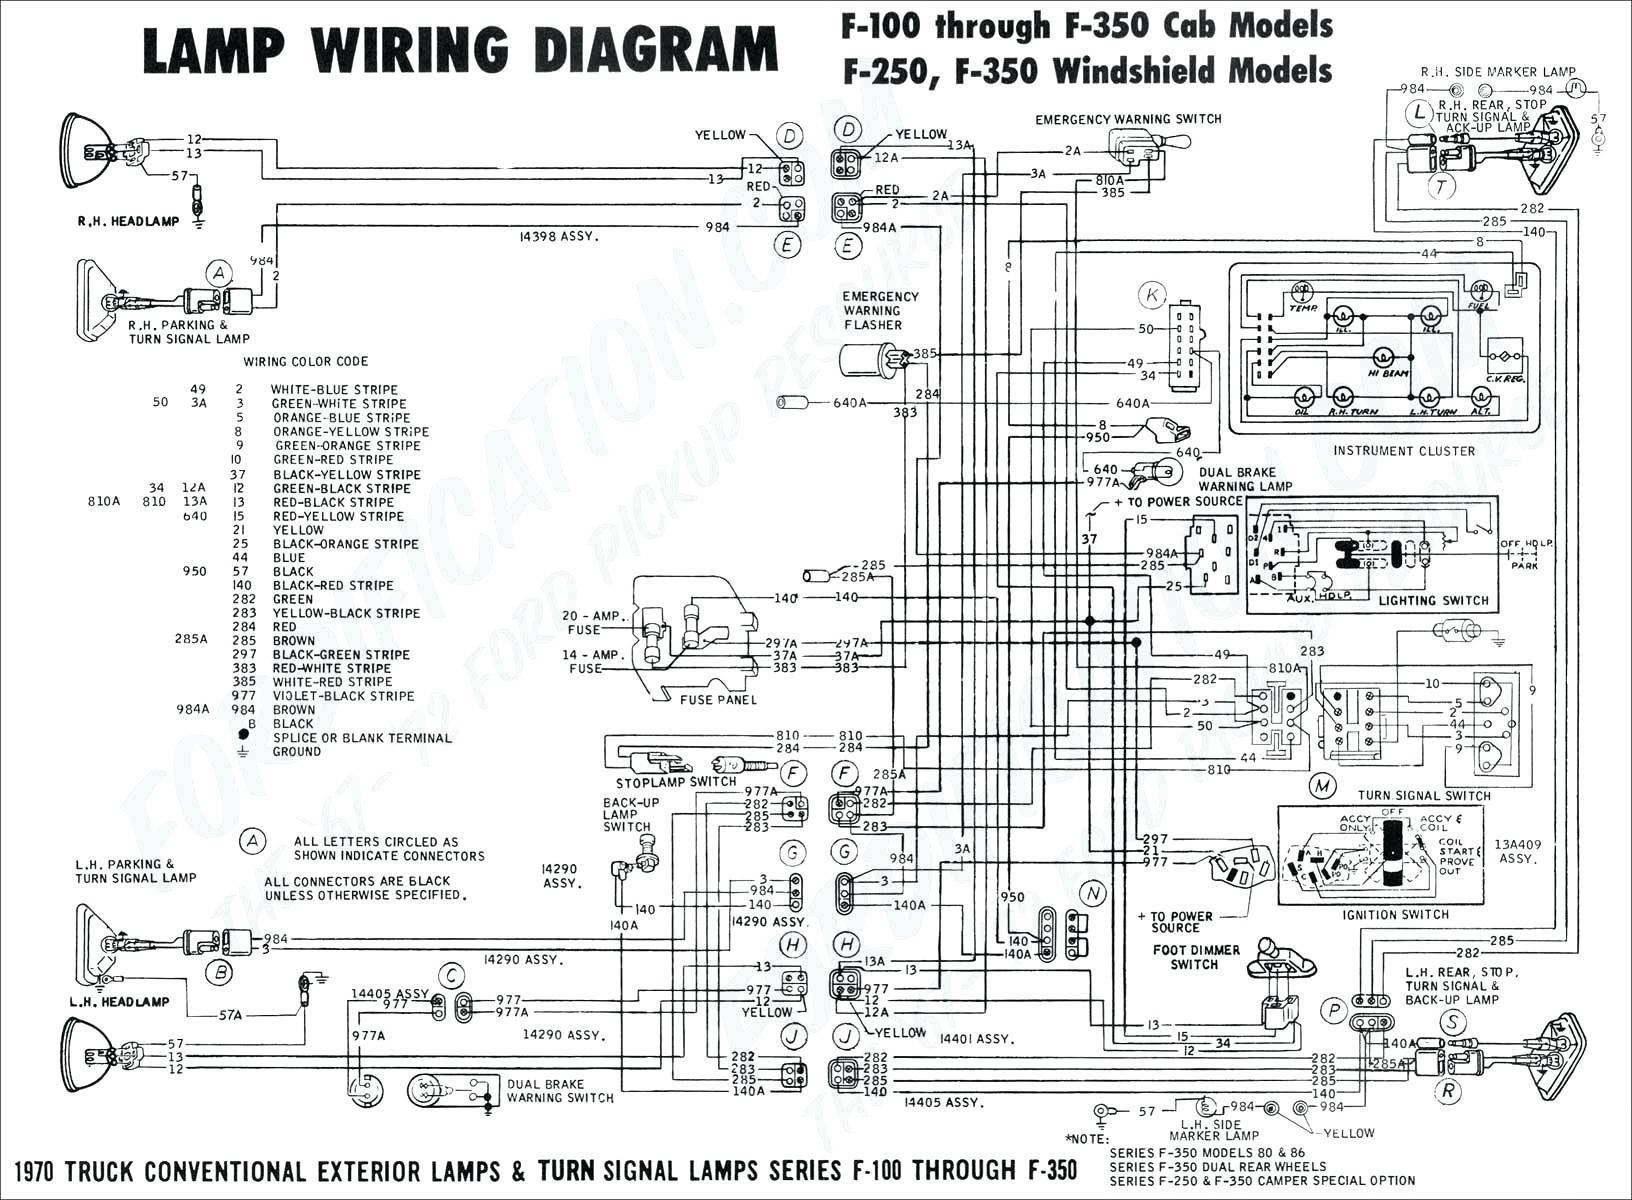 hight resolution of ace caravan wiring diagram just wiring diagram 600 ace wiring diagram ace caravan wiring diagram wiring